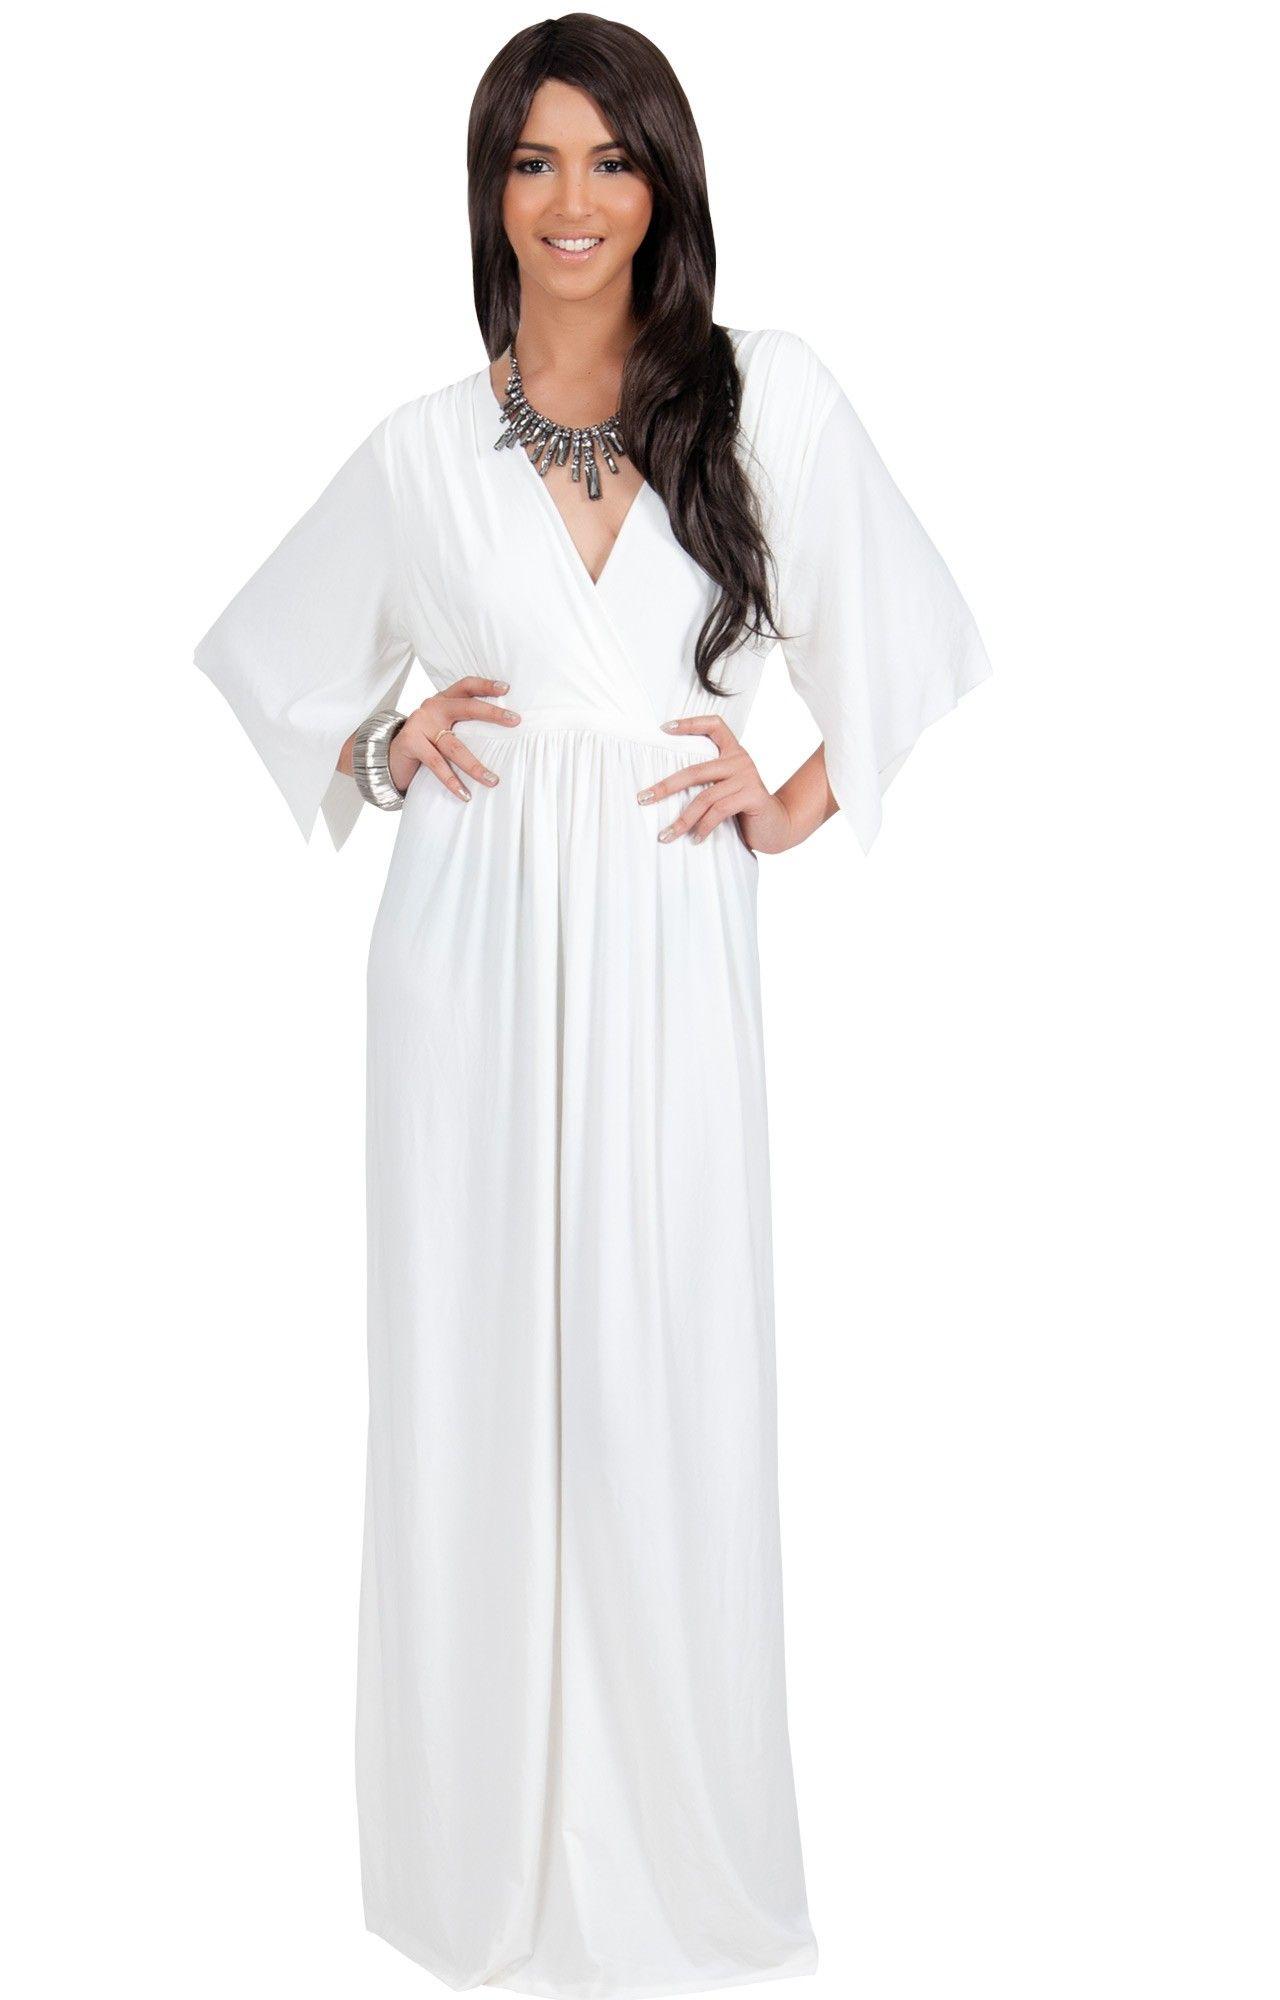 Plus Size Maxi Dress Full Figure Curvy Slimming Flattering